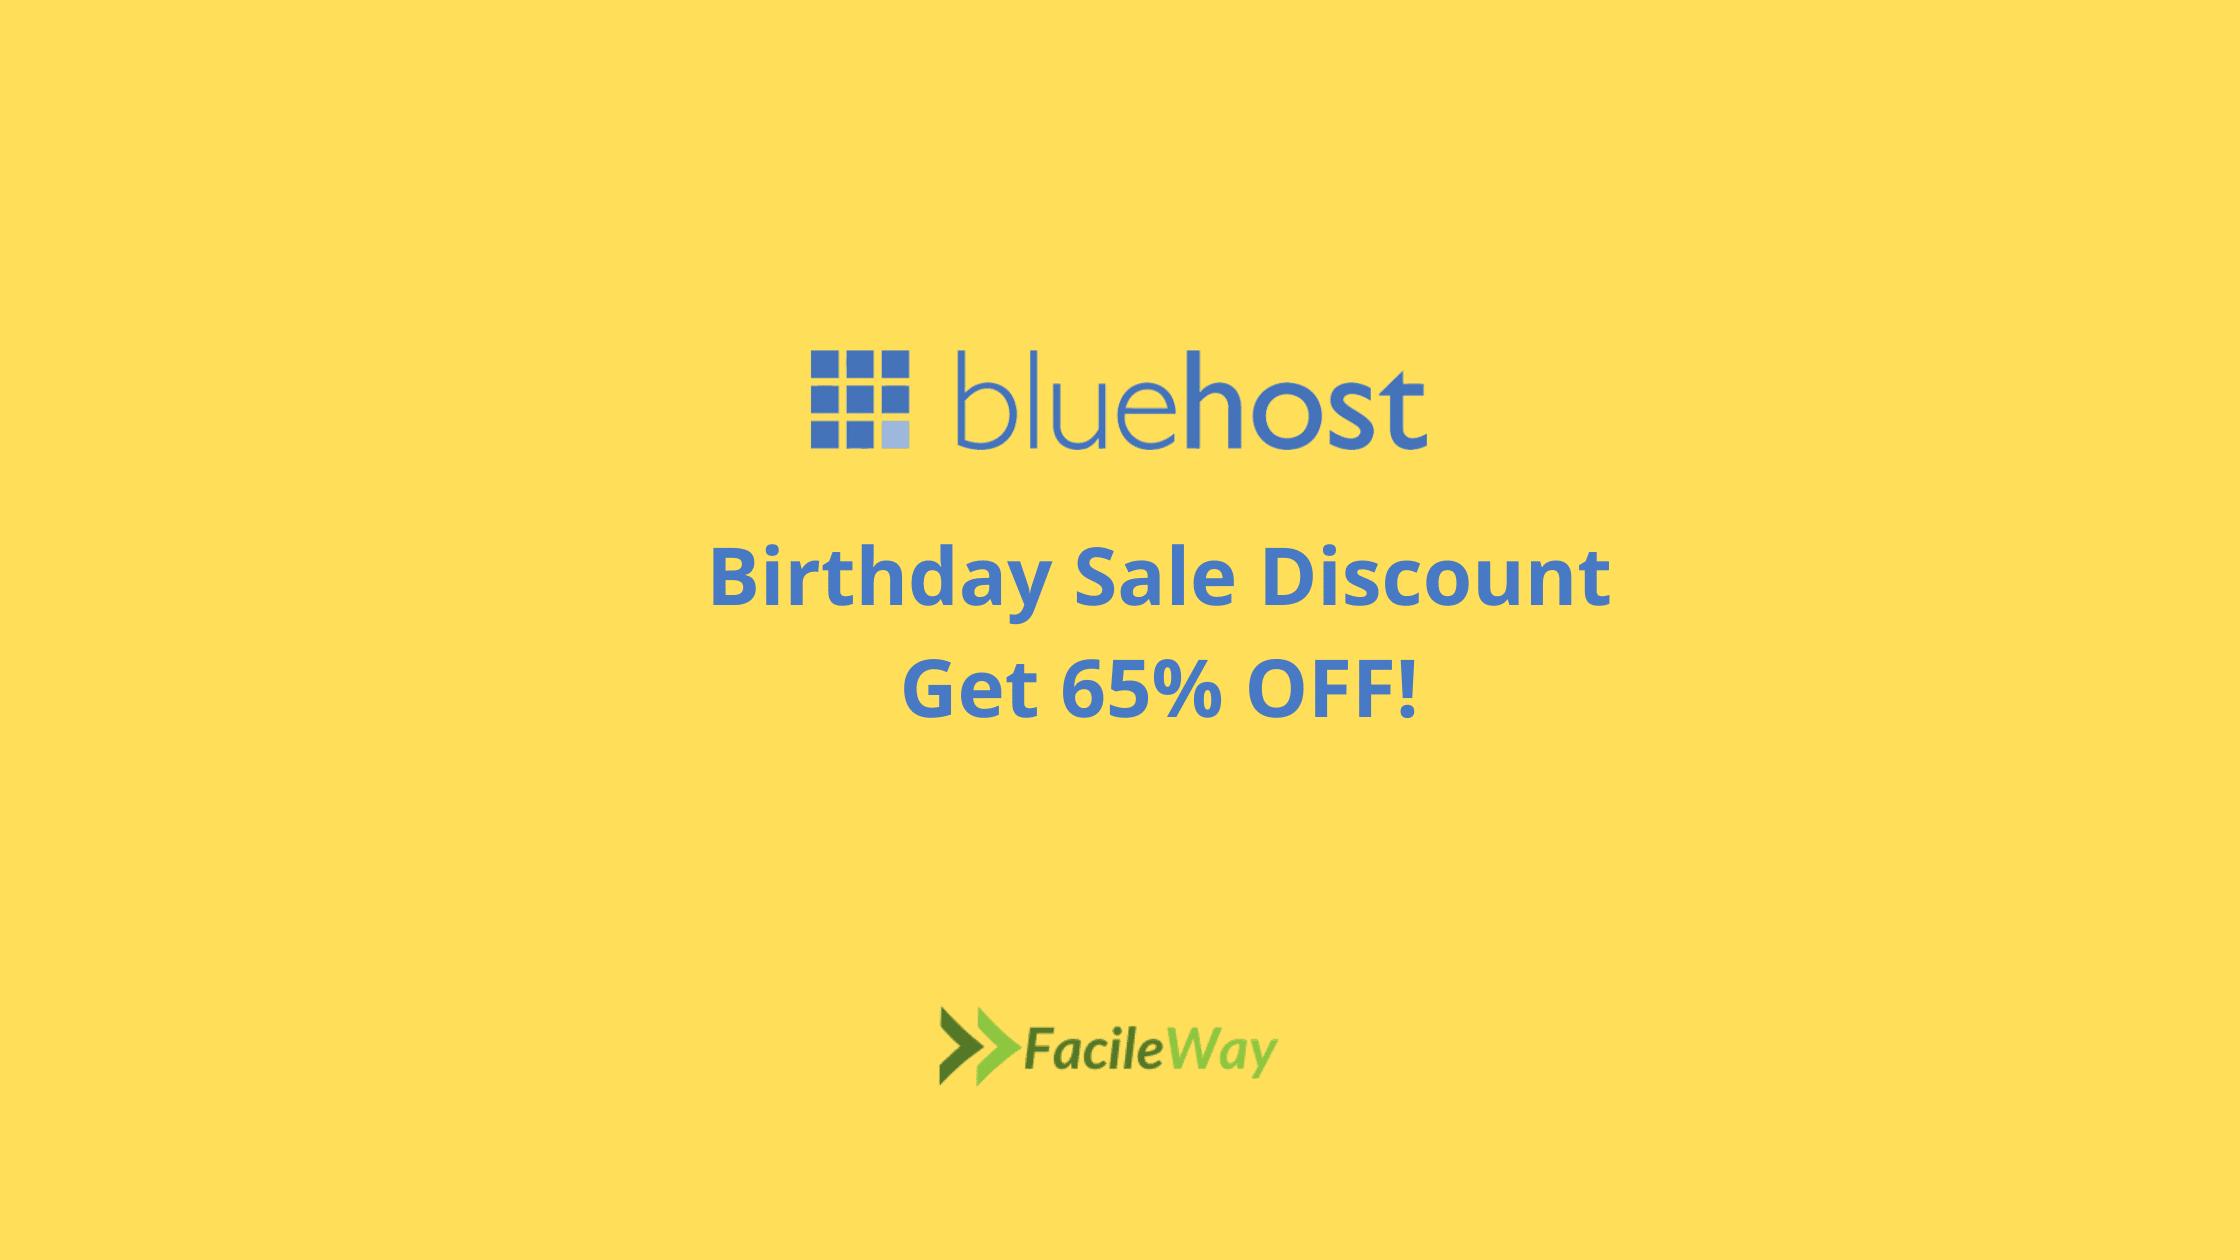 Bluehost Birthday Sale Offer